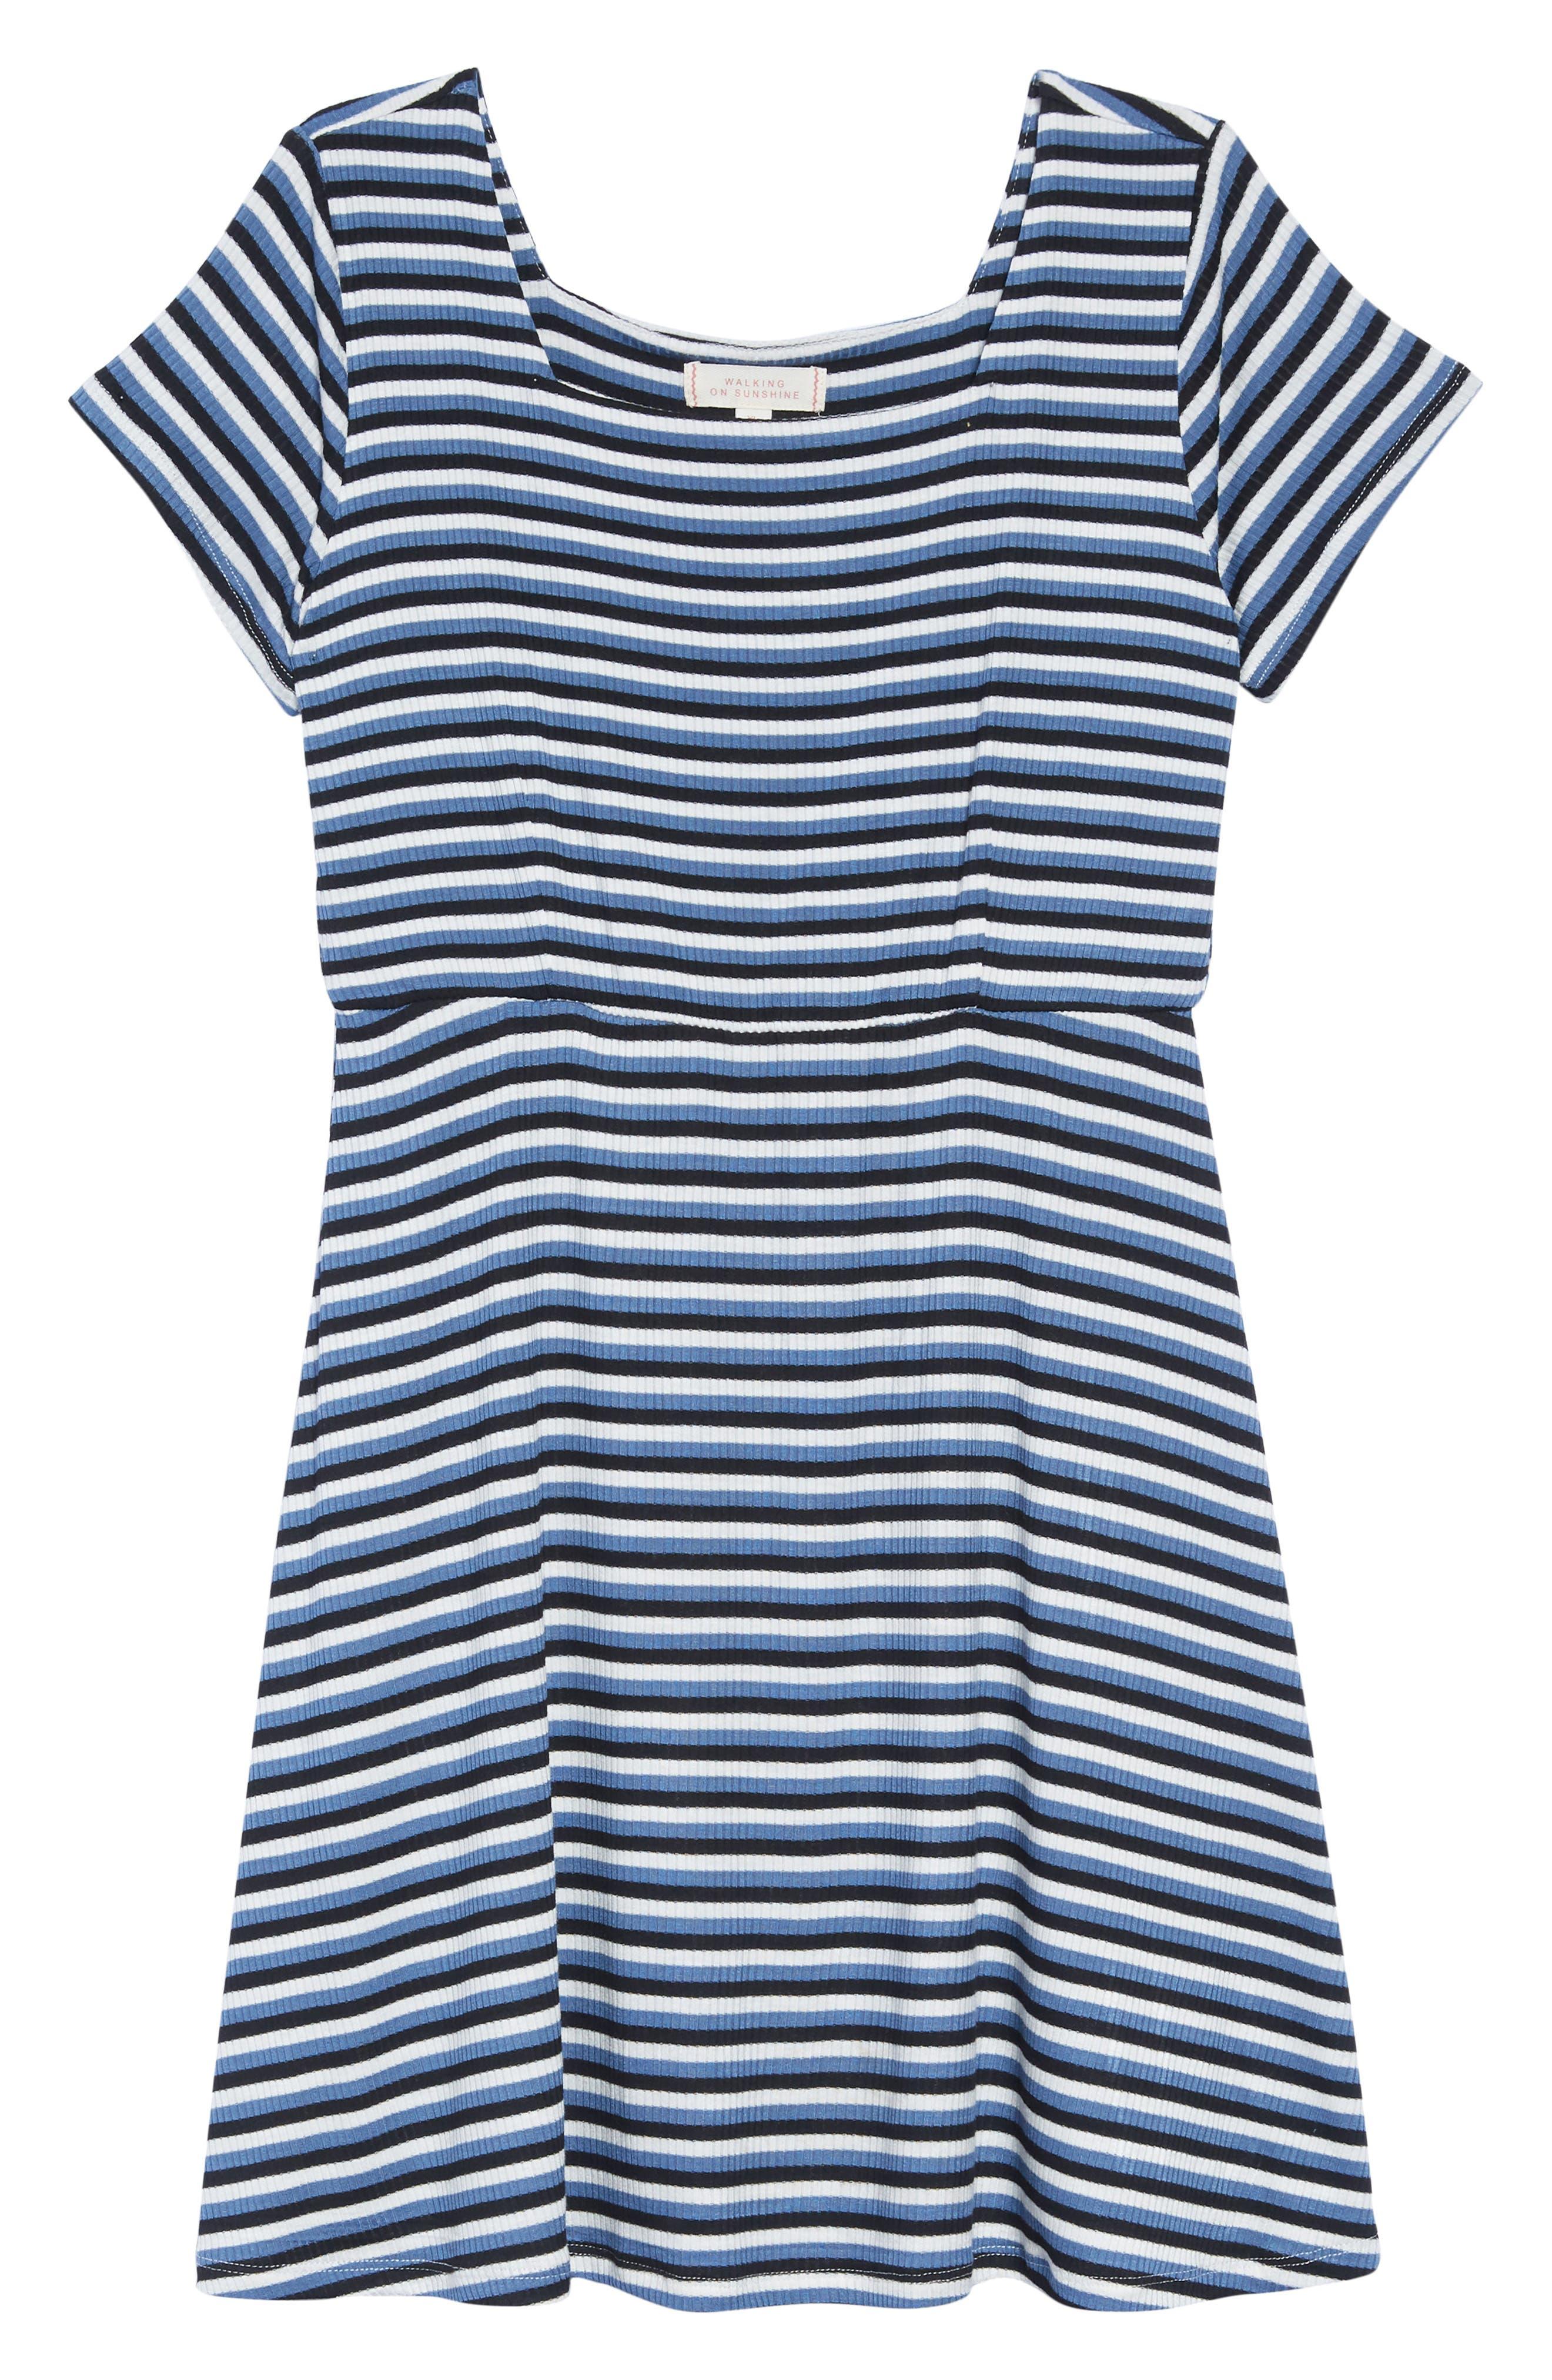 Square Neck A-Line Dress,                             Main thumbnail 1, color,                             NAVY